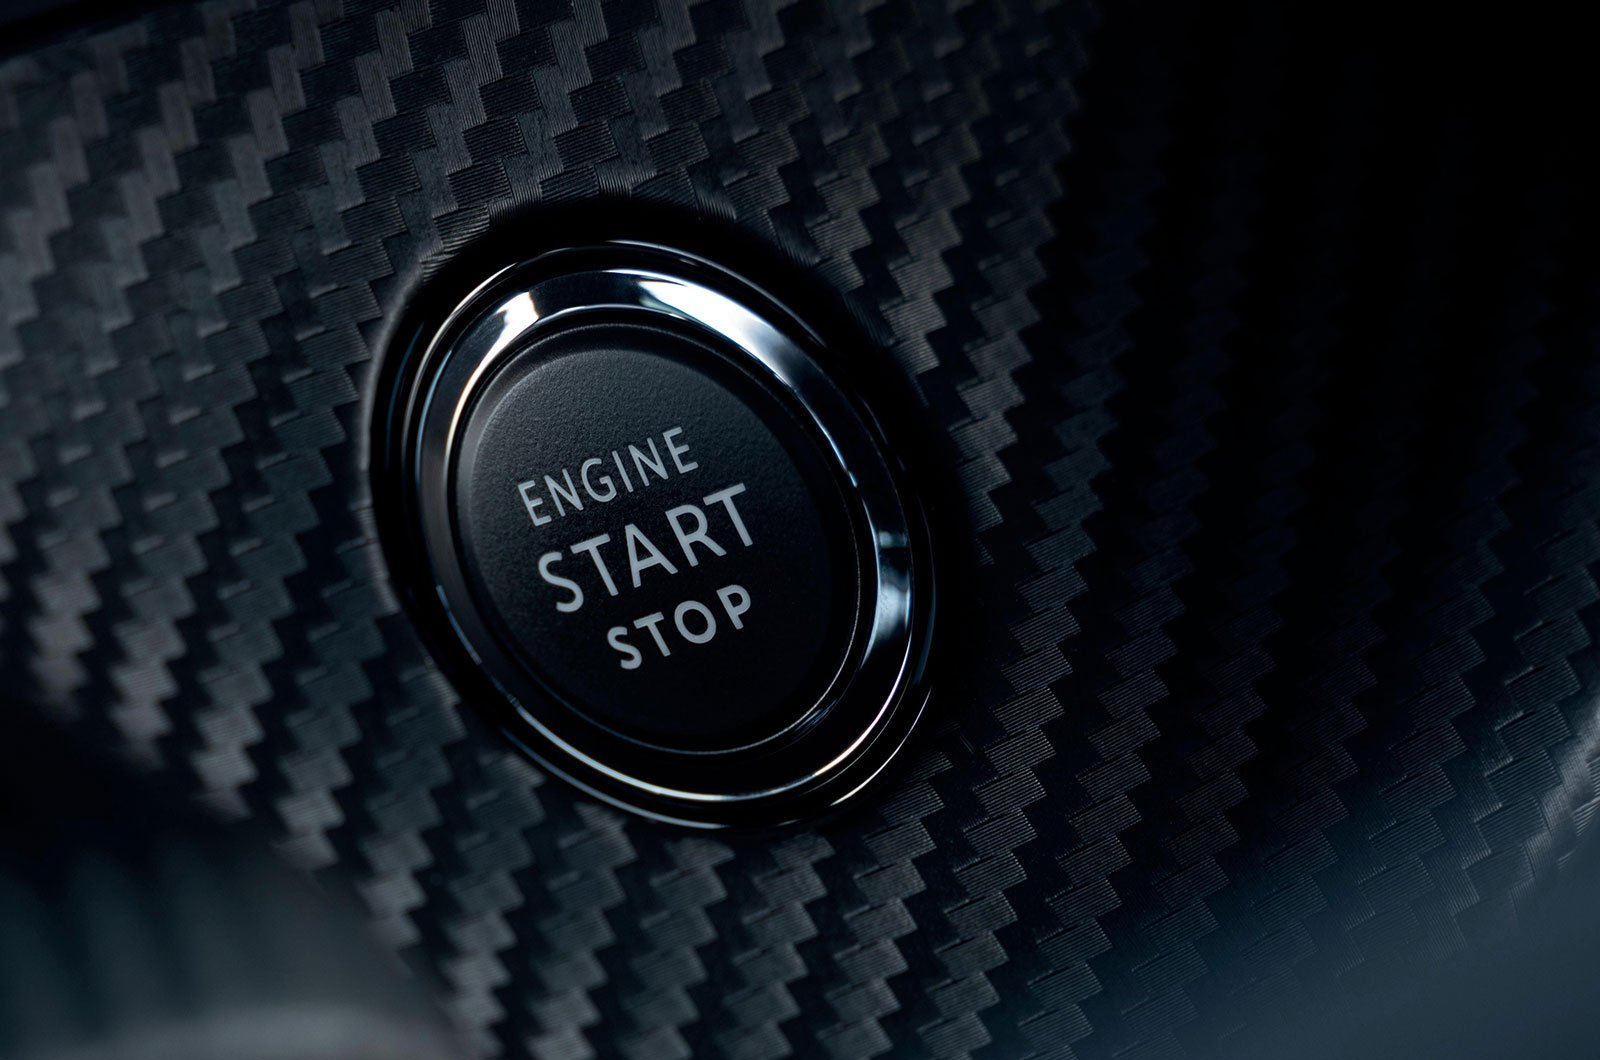 Peugeot engine start button